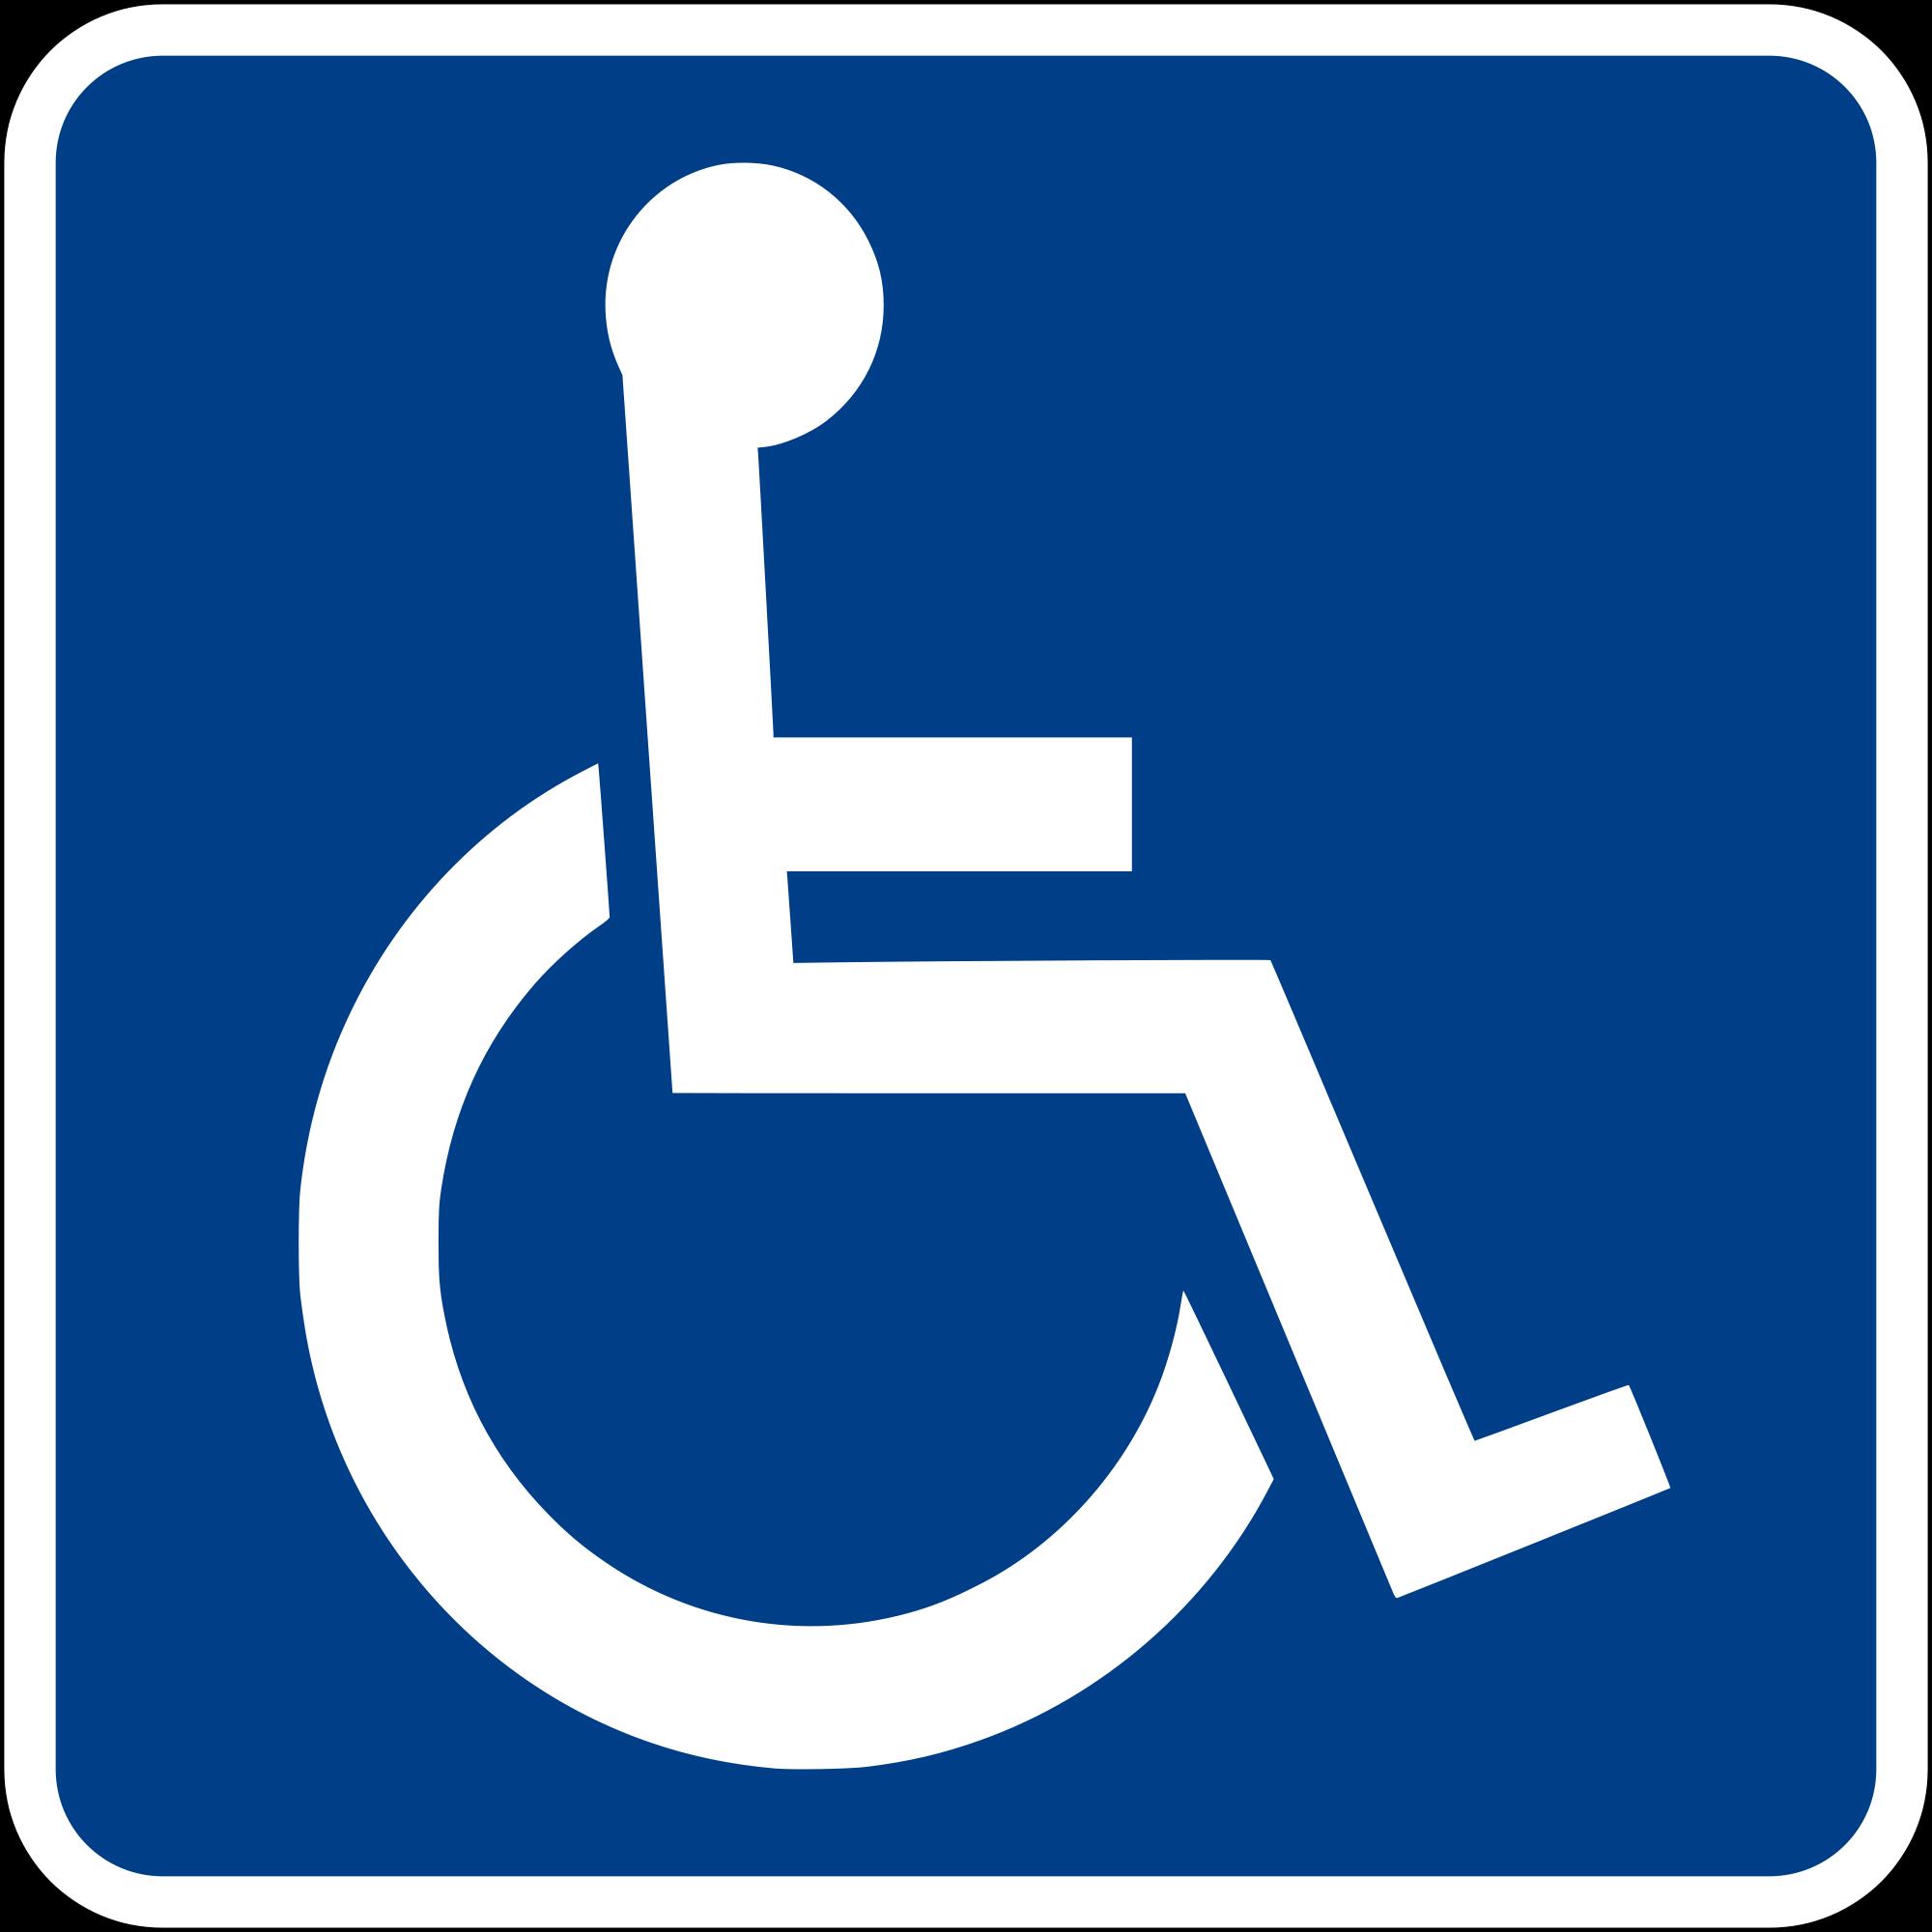 desabilitado simbolo Seguridad Vial